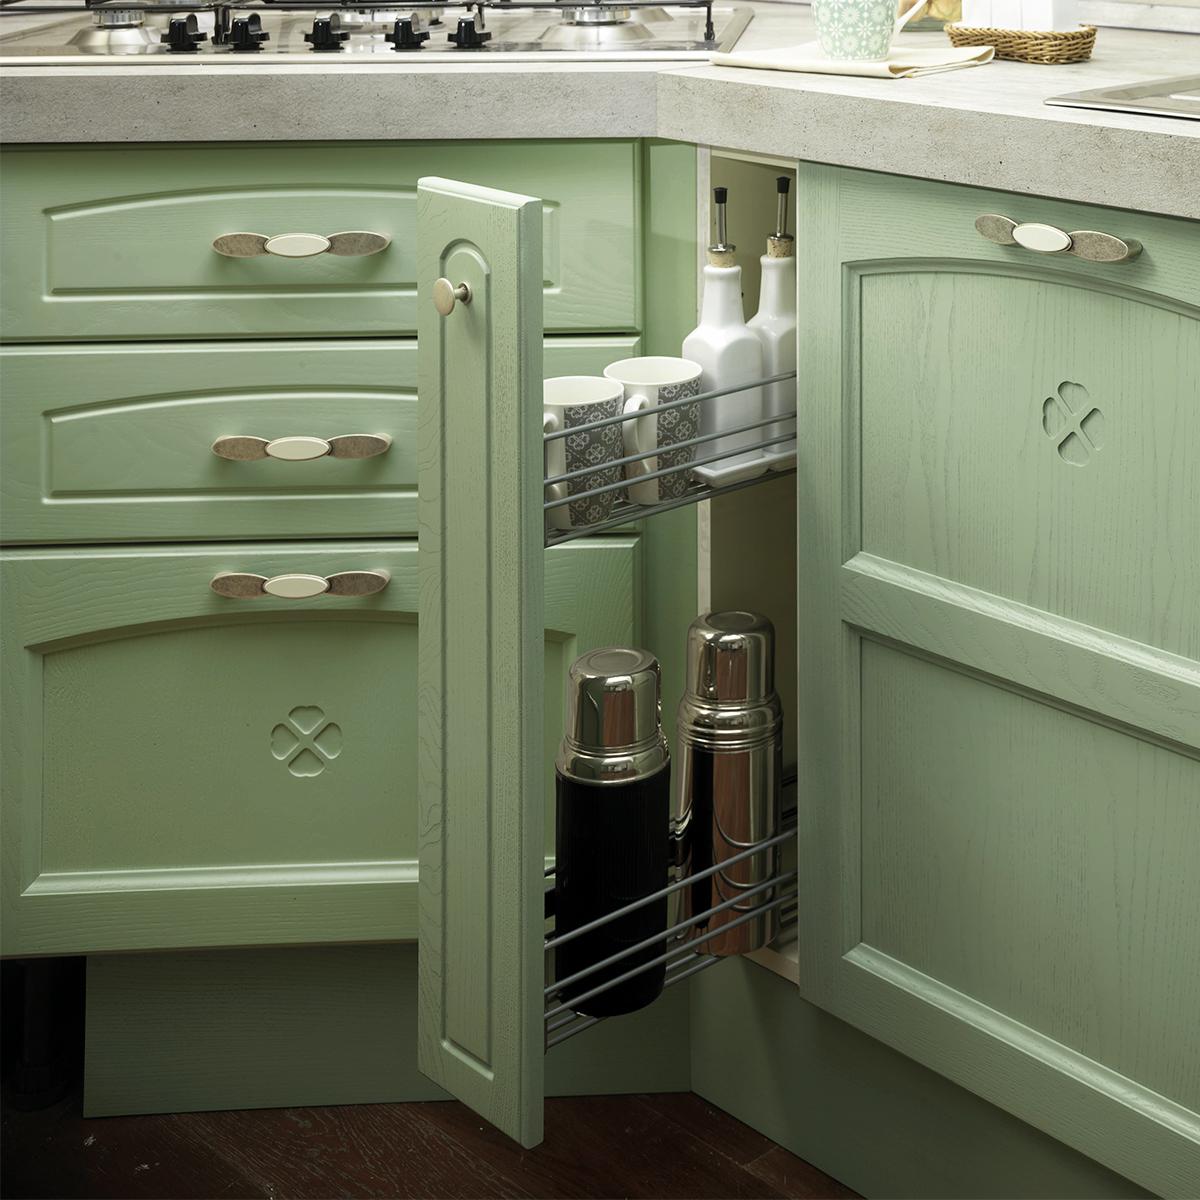 Cucina componibile verde patinato carmen 0b2b - Ante cucina mondo convenienza ...